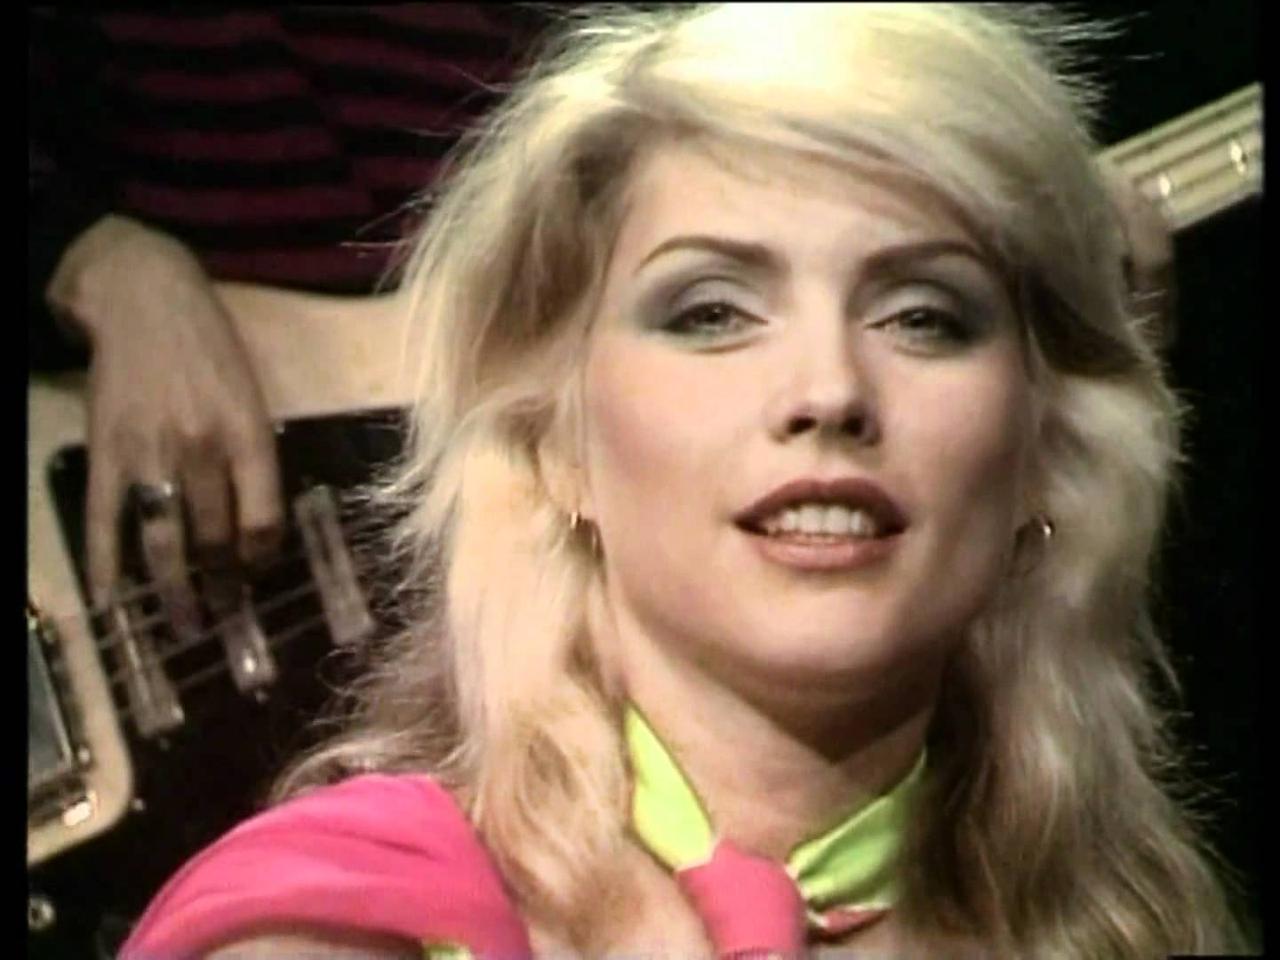 画像: Blondie Heart of glass HD youtu.be